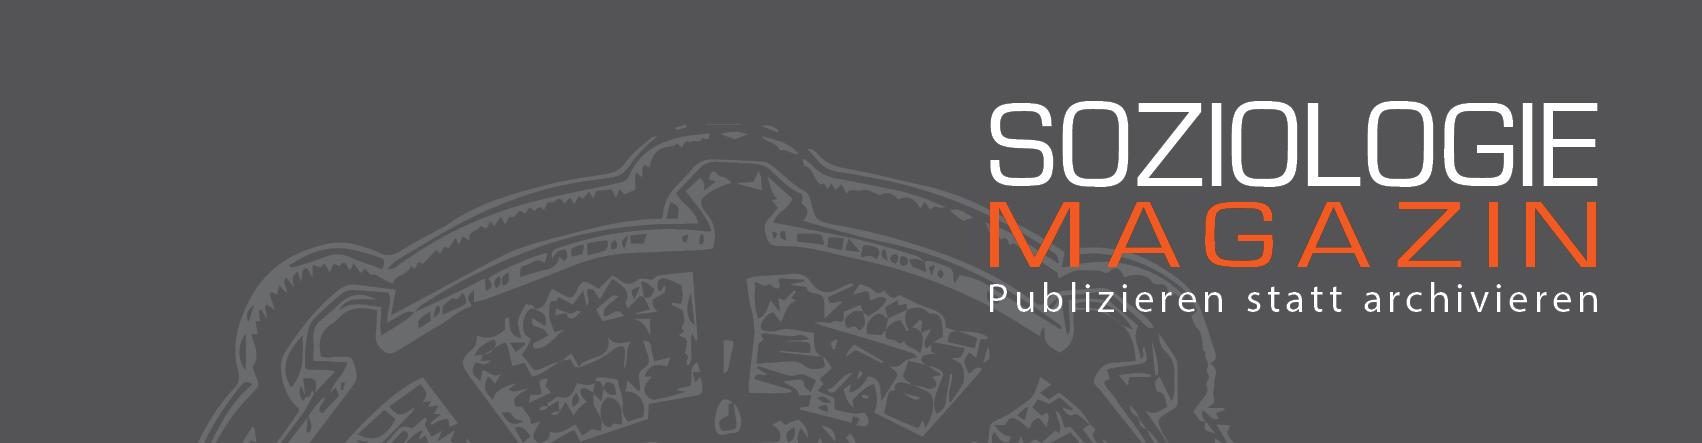 soziologieblog